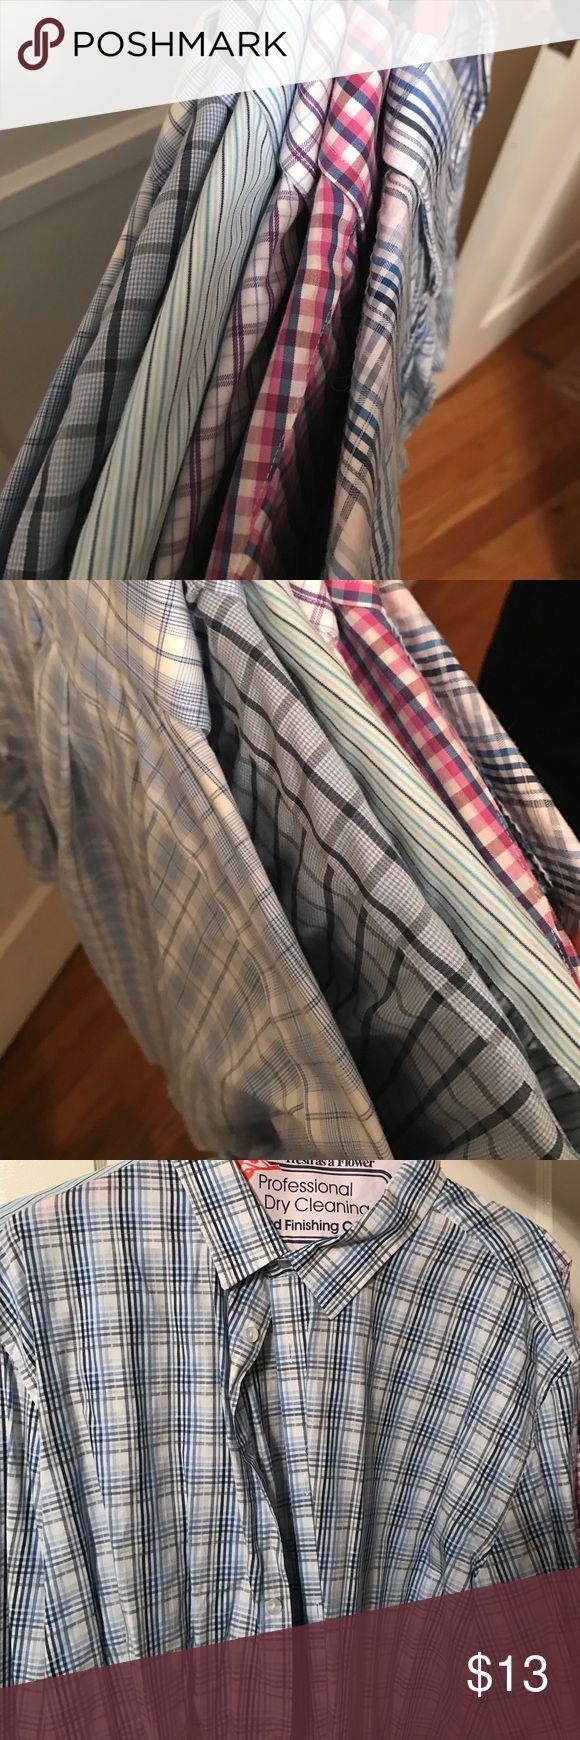 Bundle of men's dress shirts! 17x34 6 shirts Kirkland brand slim fit dress shirts.  Bundle of 6!  All perfect condition, very lightly worn. One is CK One XL.  Rest are Kirkland. Each is $13. kirkland Shirts Dress Shirts